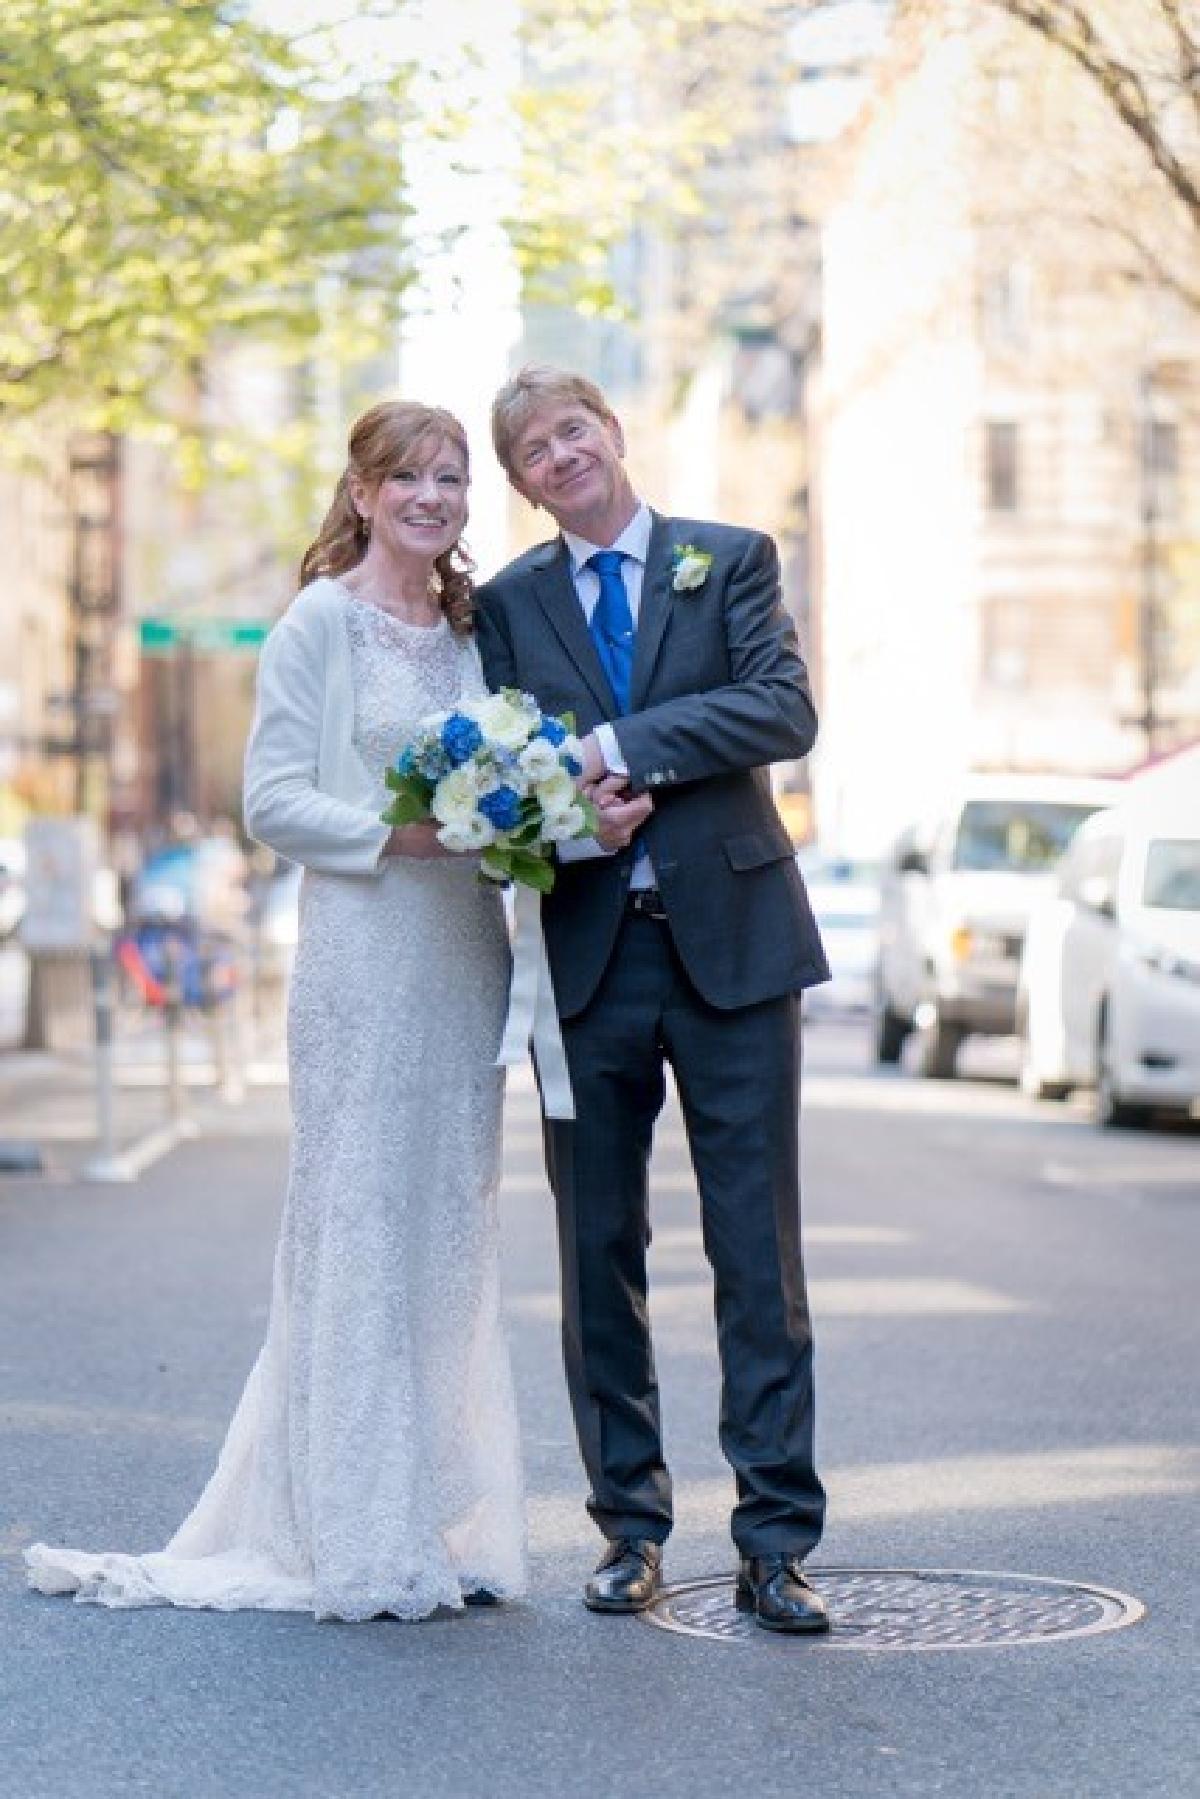 Eva og Jens Erik, New York, 15. april 2016